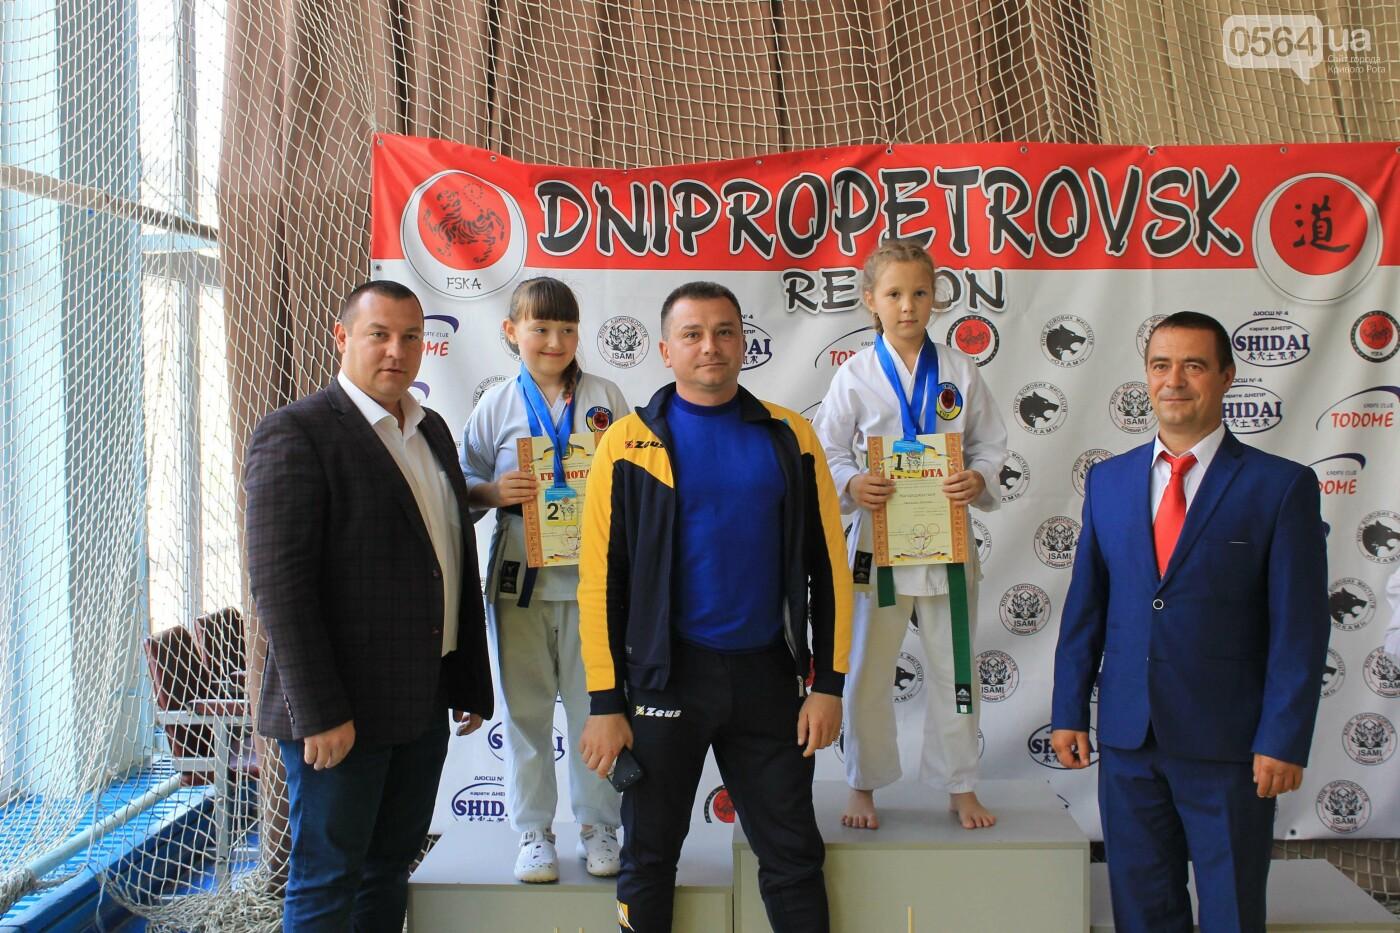 Криворожане завоевали областной Кубок по фунакоши шотокан каратэ, - ФОТО , фото-10